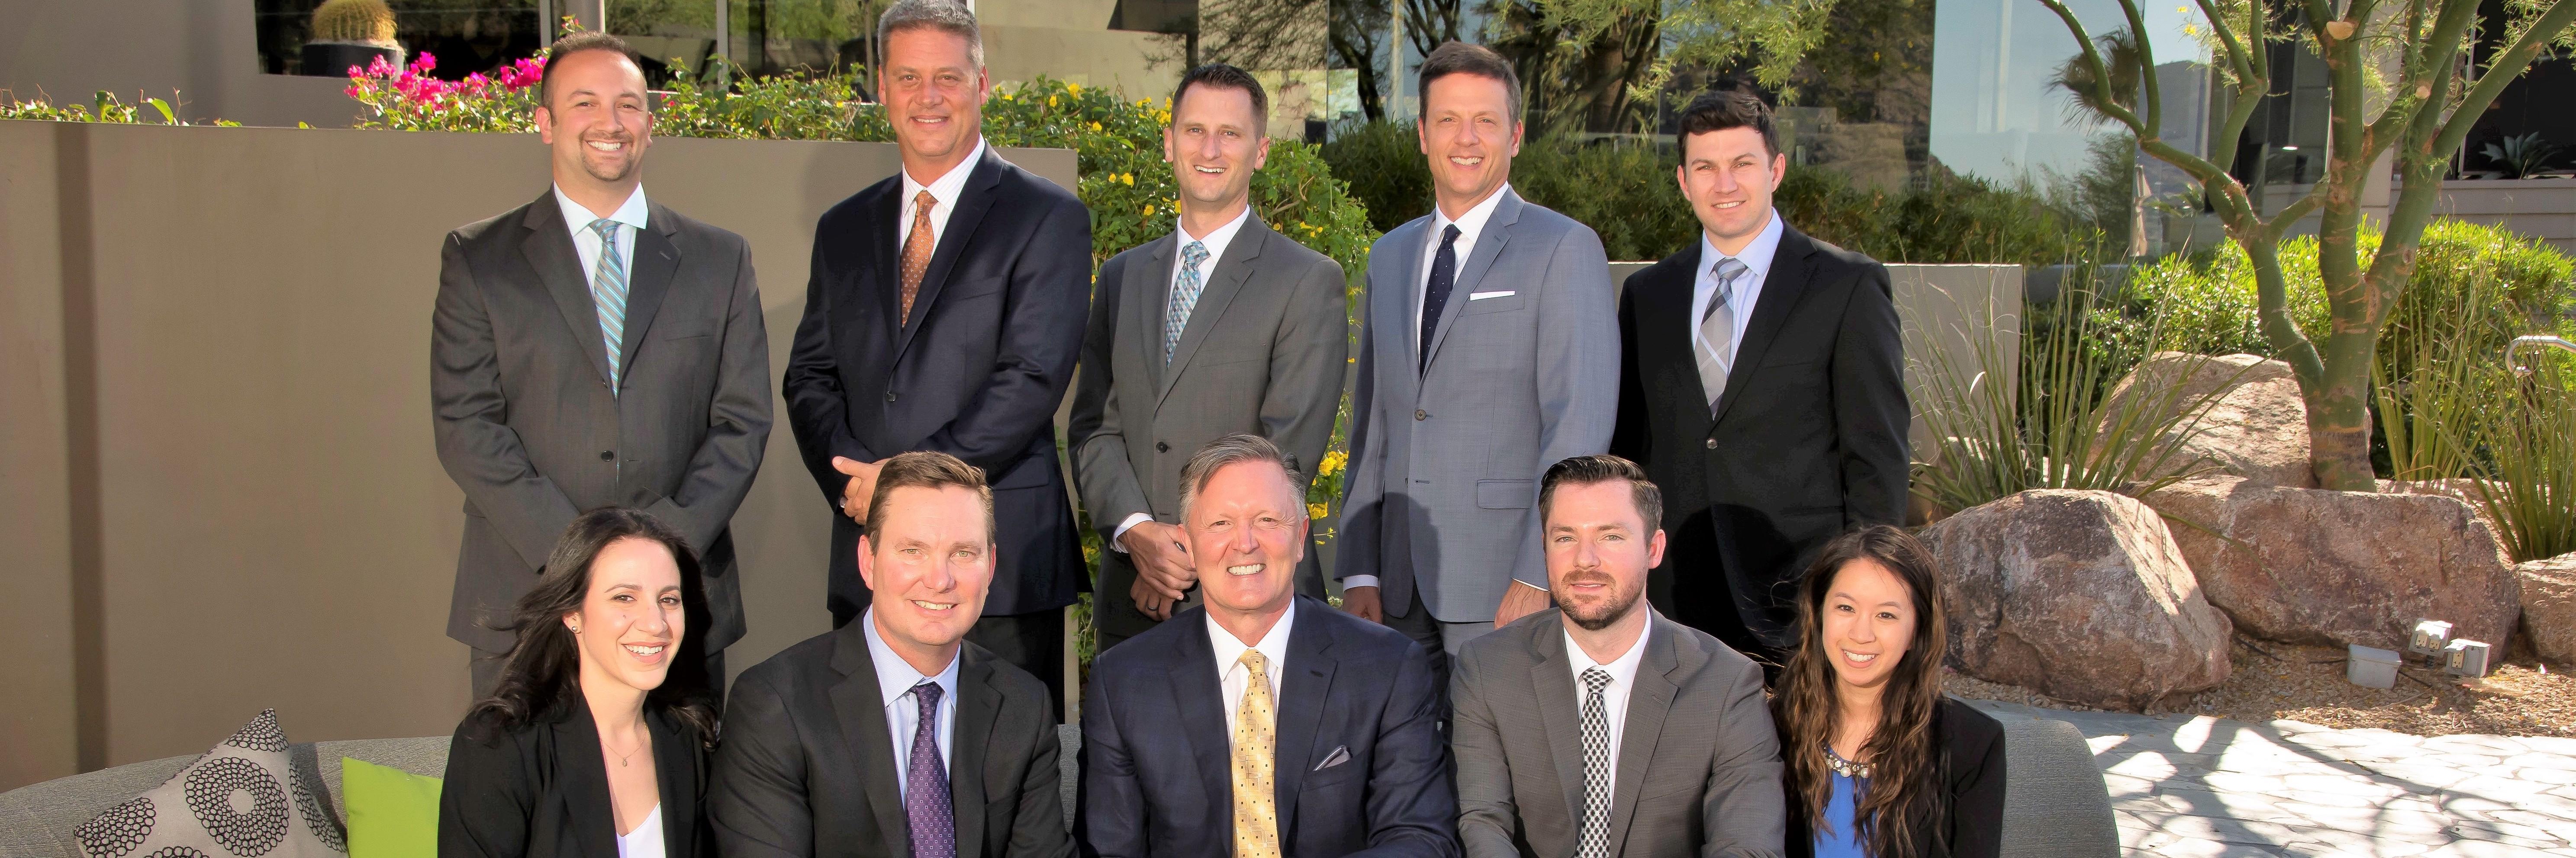 Horizon Group doctors-1-1.jpg